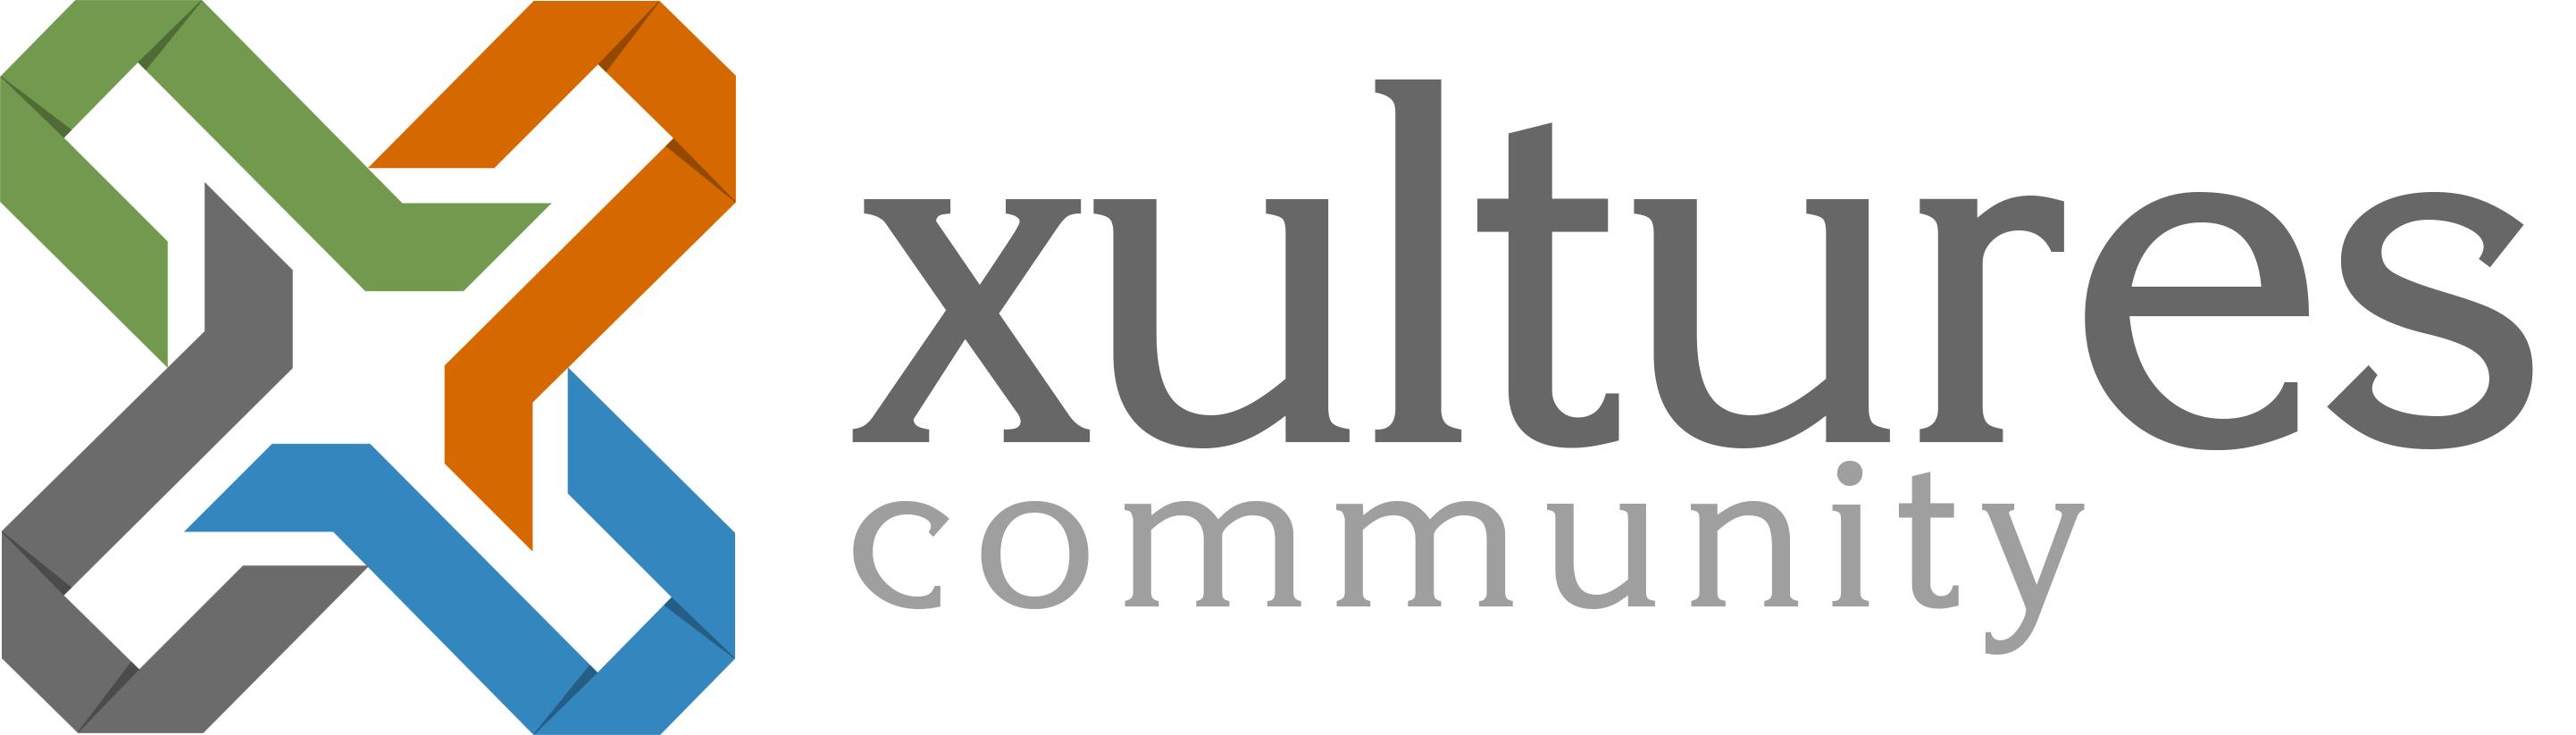 Xultures Community